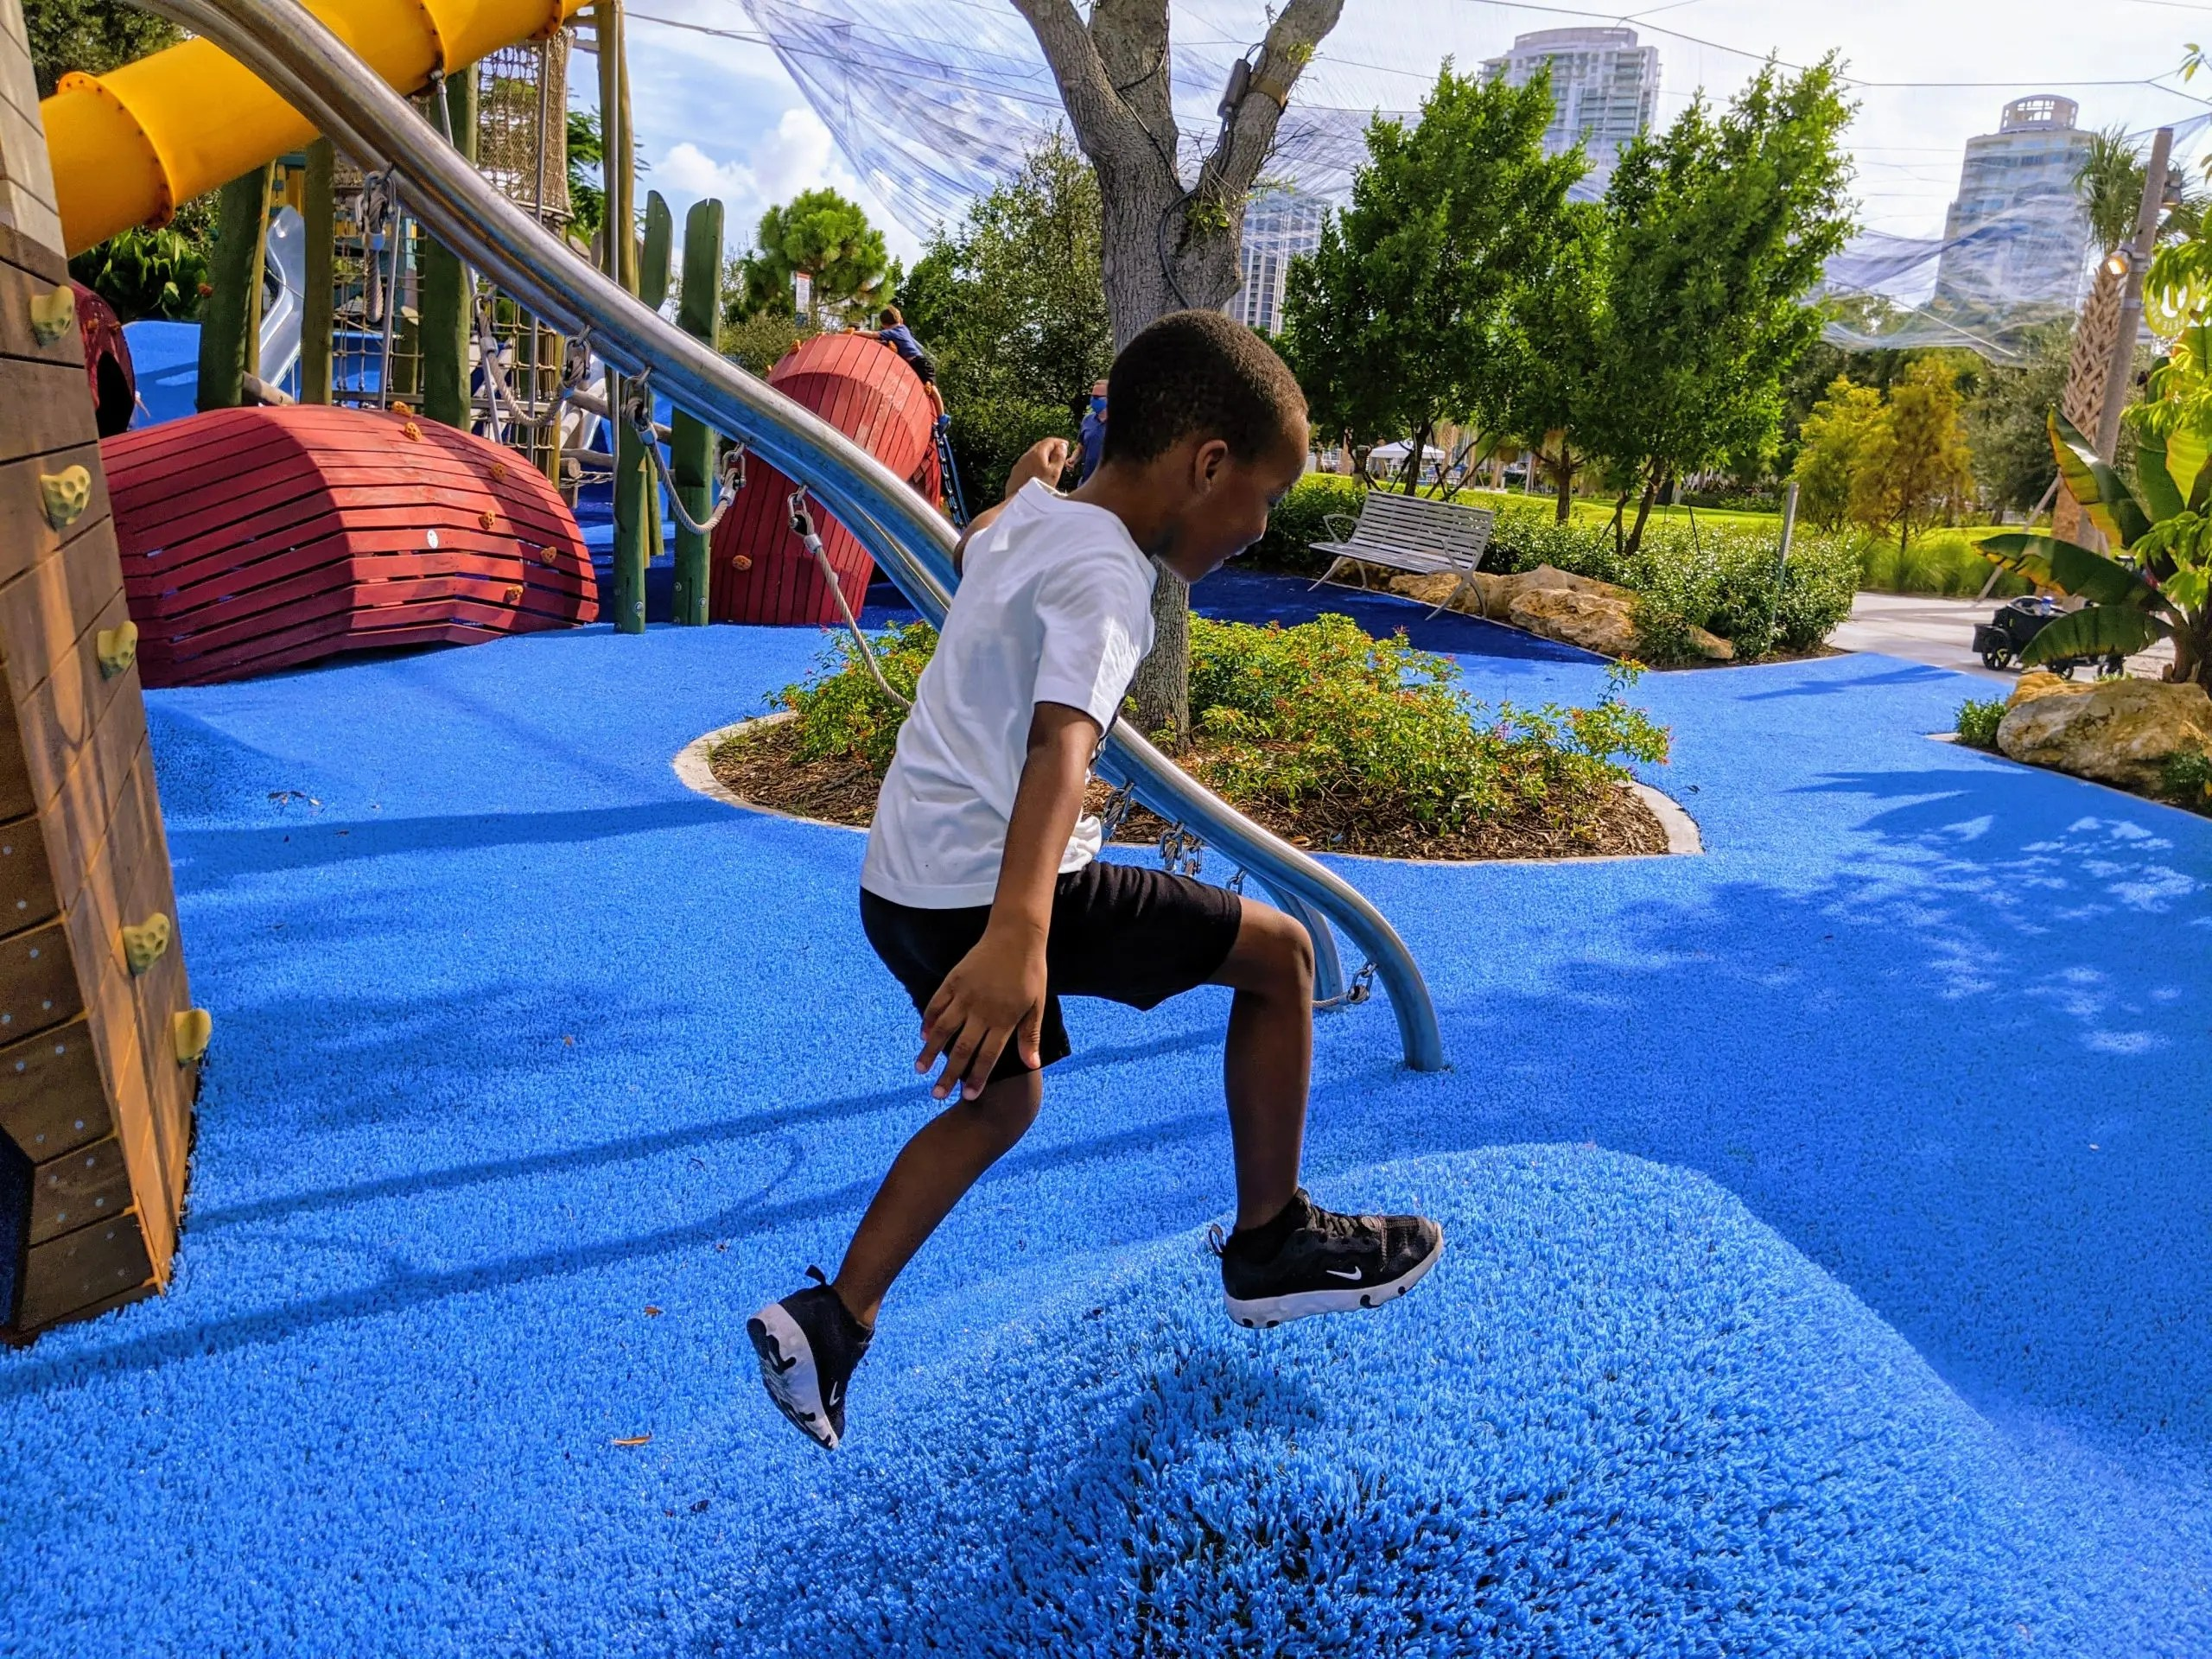 St. Pete Pier playground